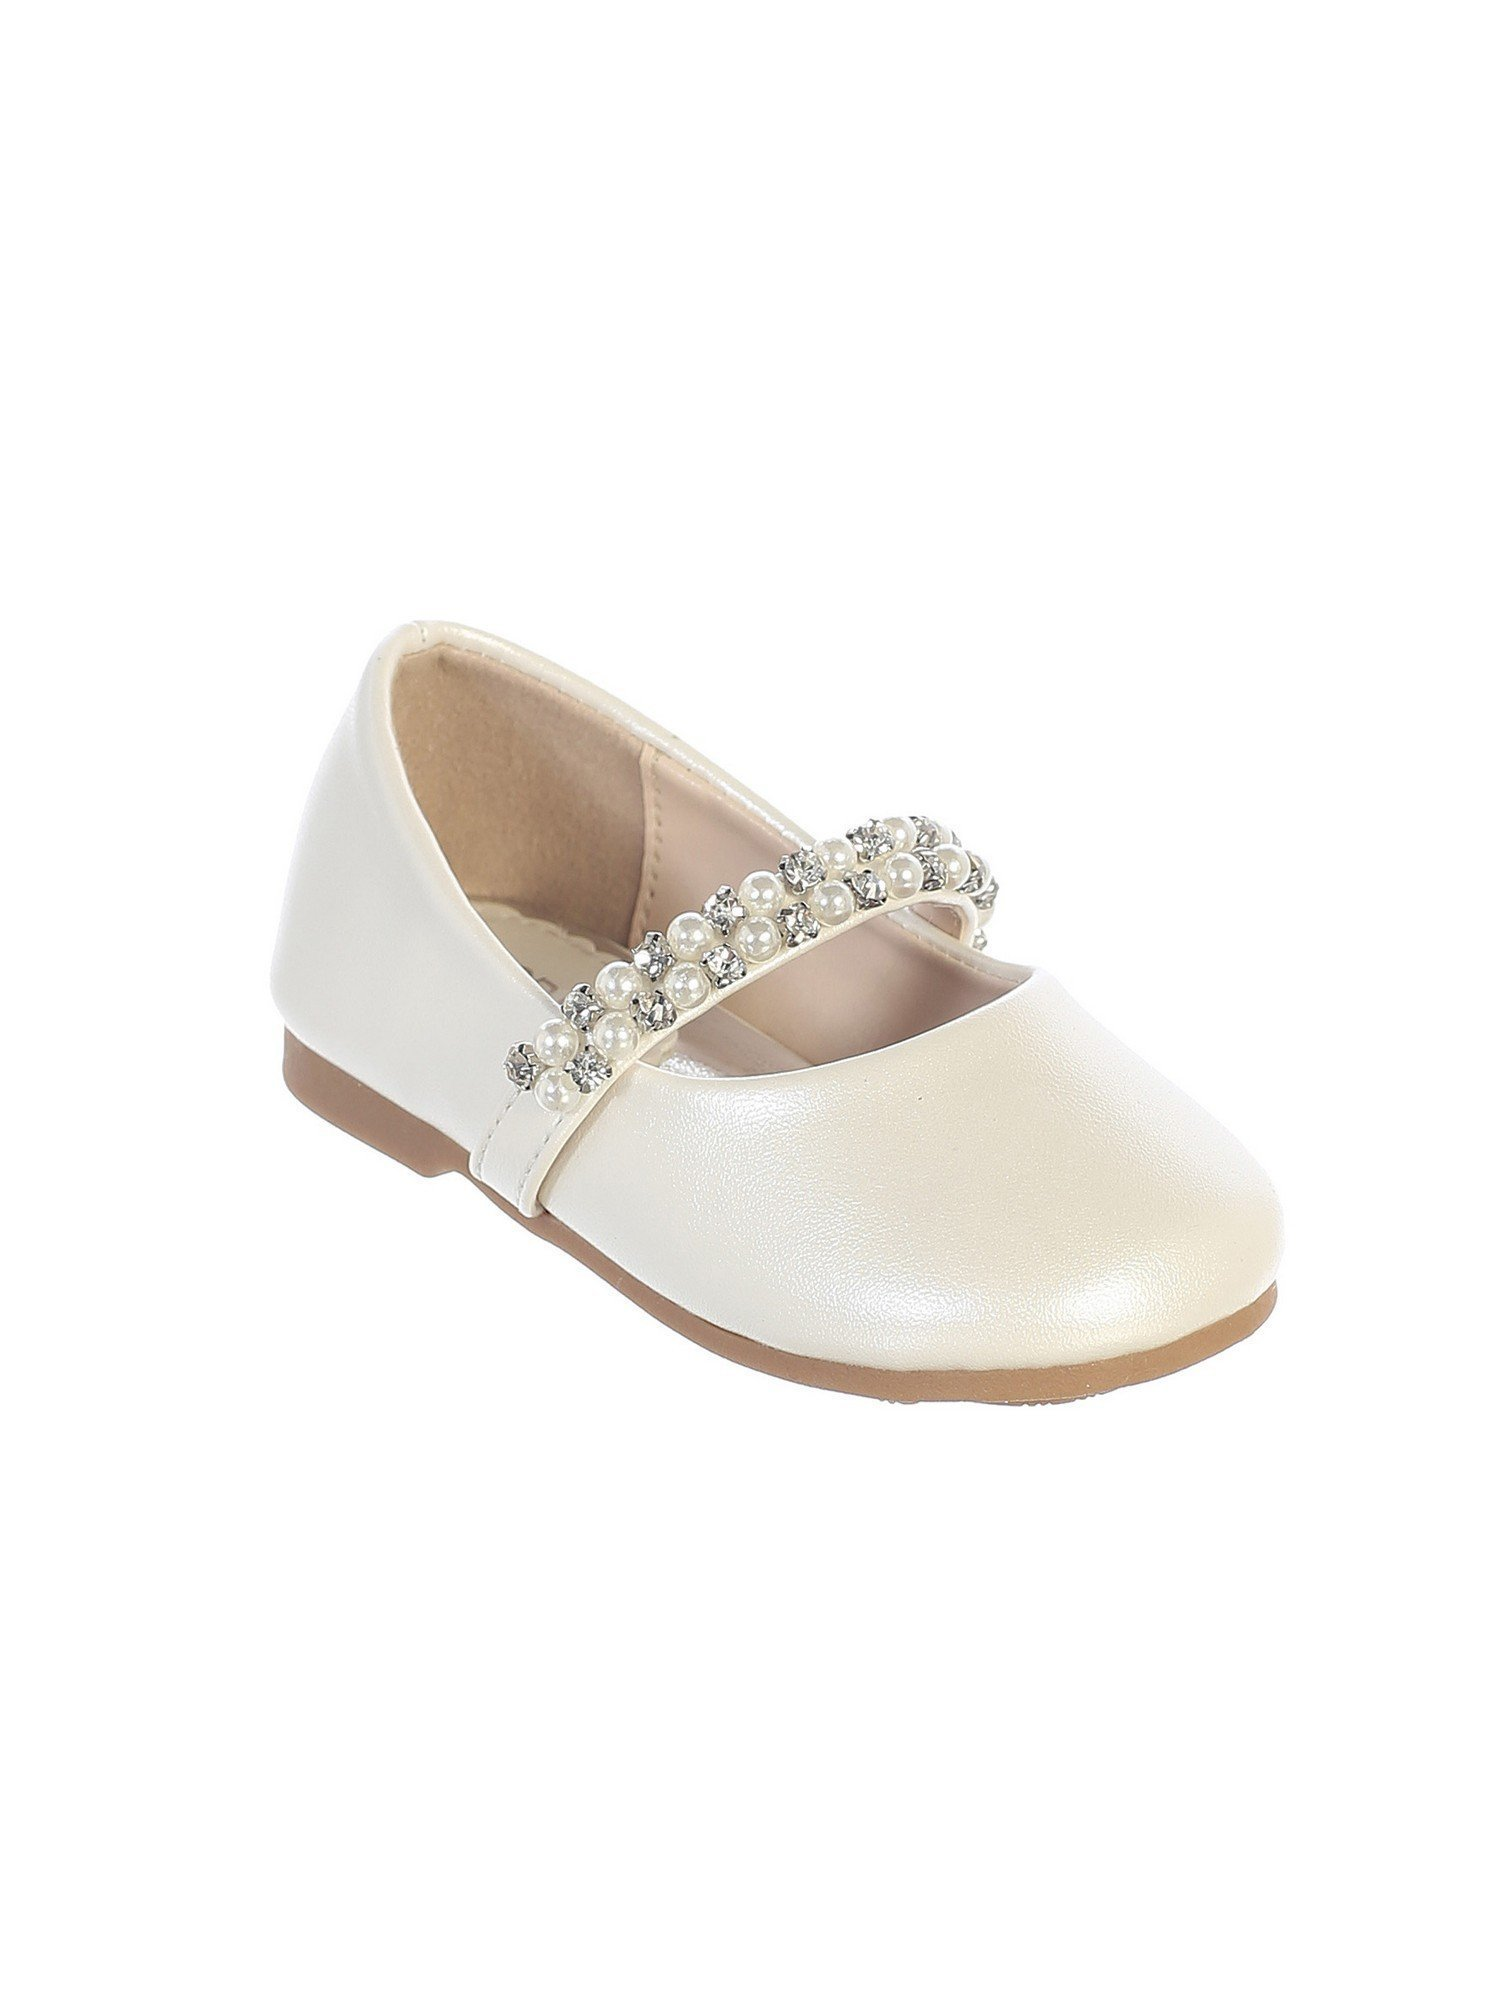 Little Girls Ivory Rhinestone Pearl Strap Elegant Mary Jane Shoes 8 Toddler